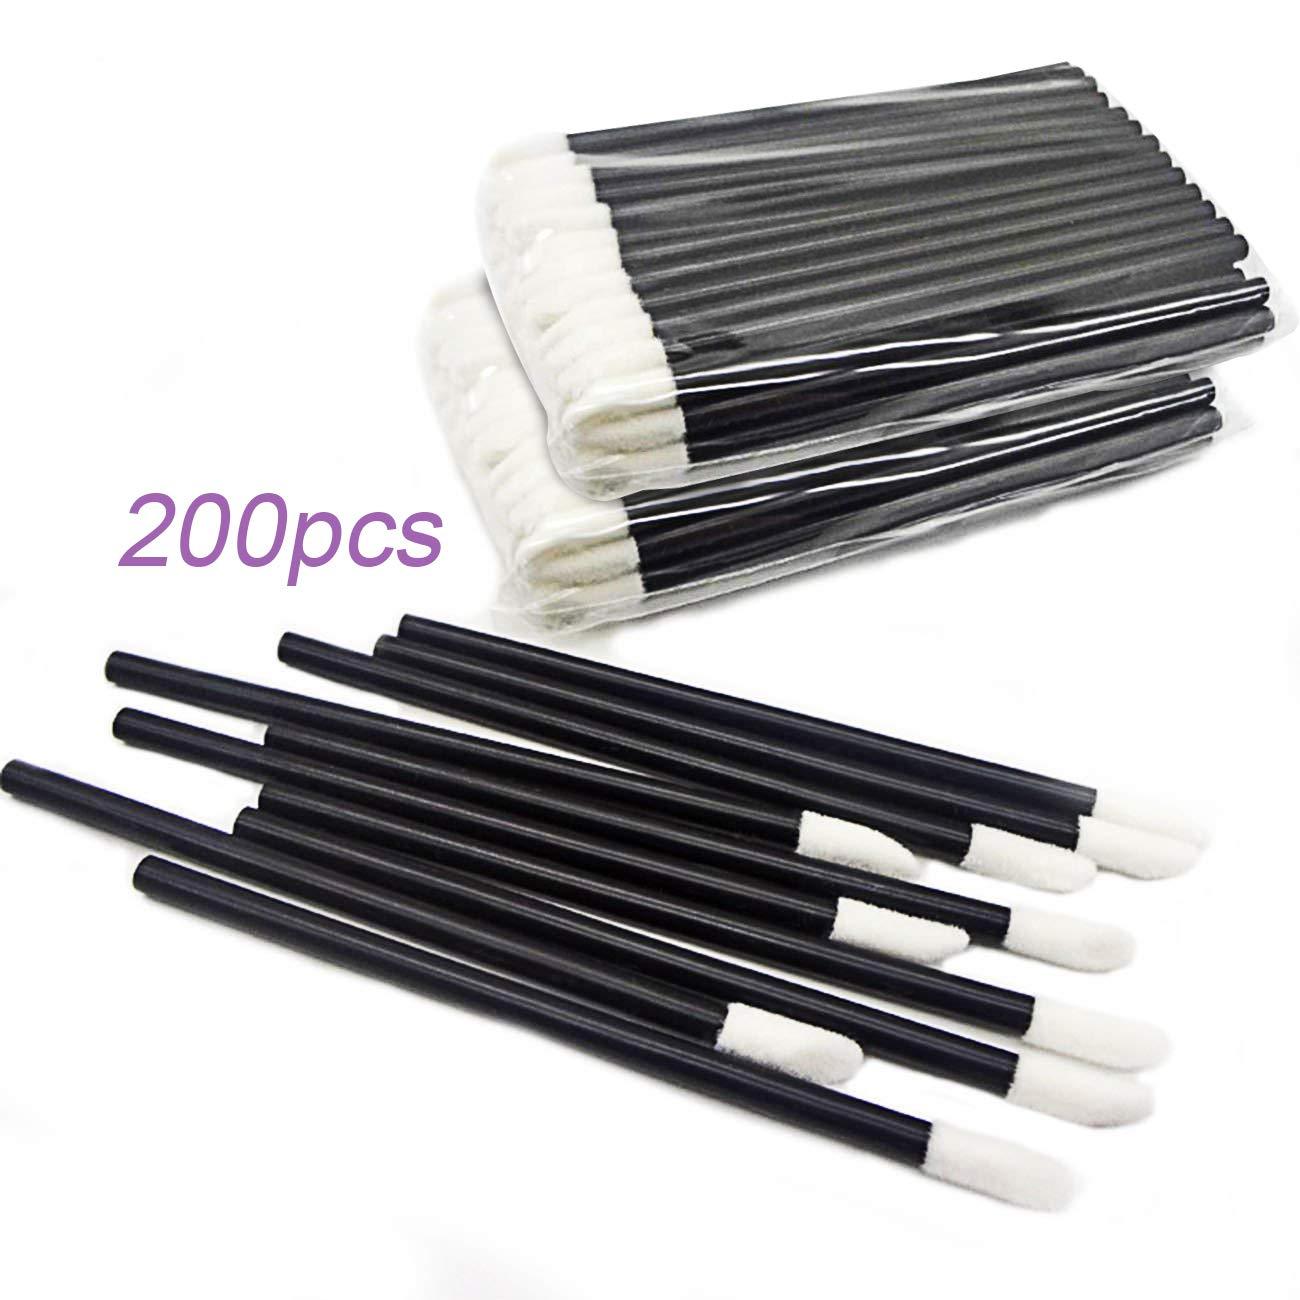 GoWorth 200Pcs/Set Disposable Lip Brushes Make Up Brush Lipstick Lip Gloss Wands Applicator Tool Makeup Beauty Tool Kits